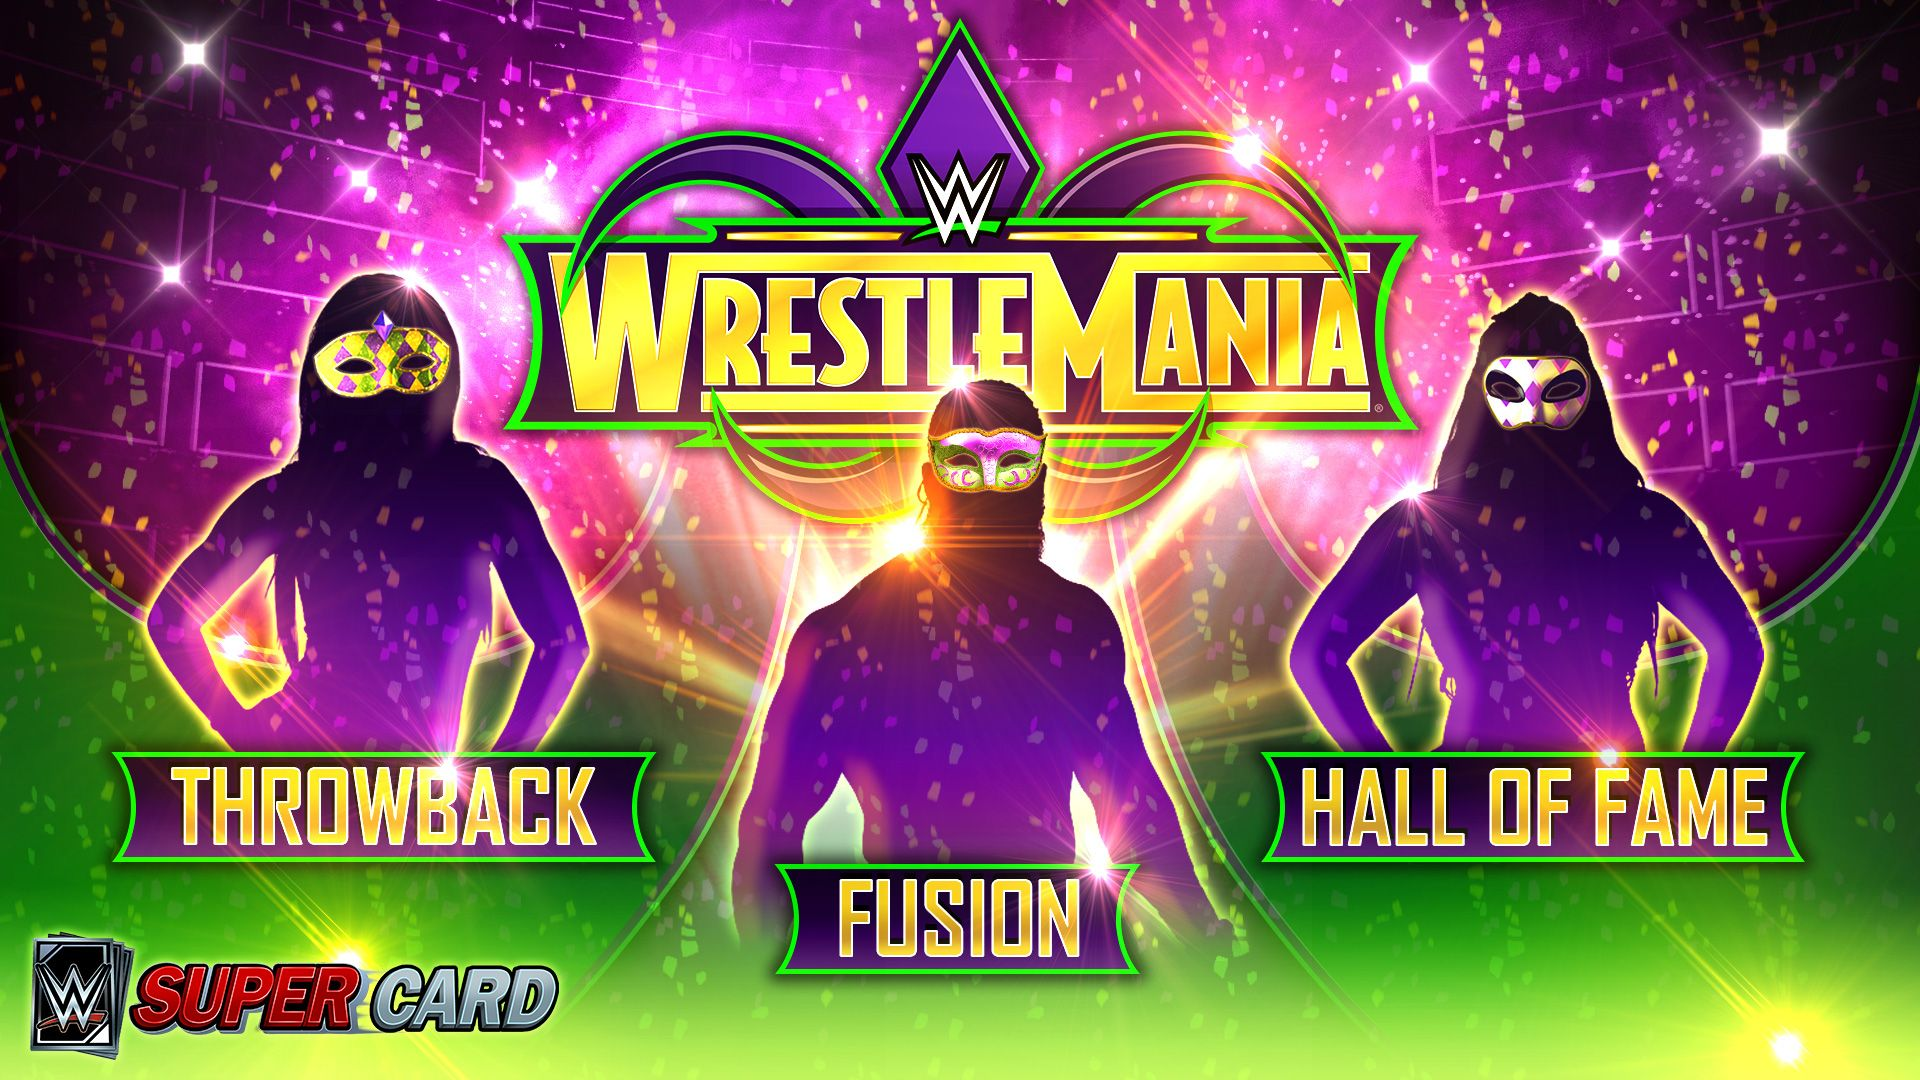 Wwe Supercard News Wrestlemania 34 Throwback Fusion And Hall